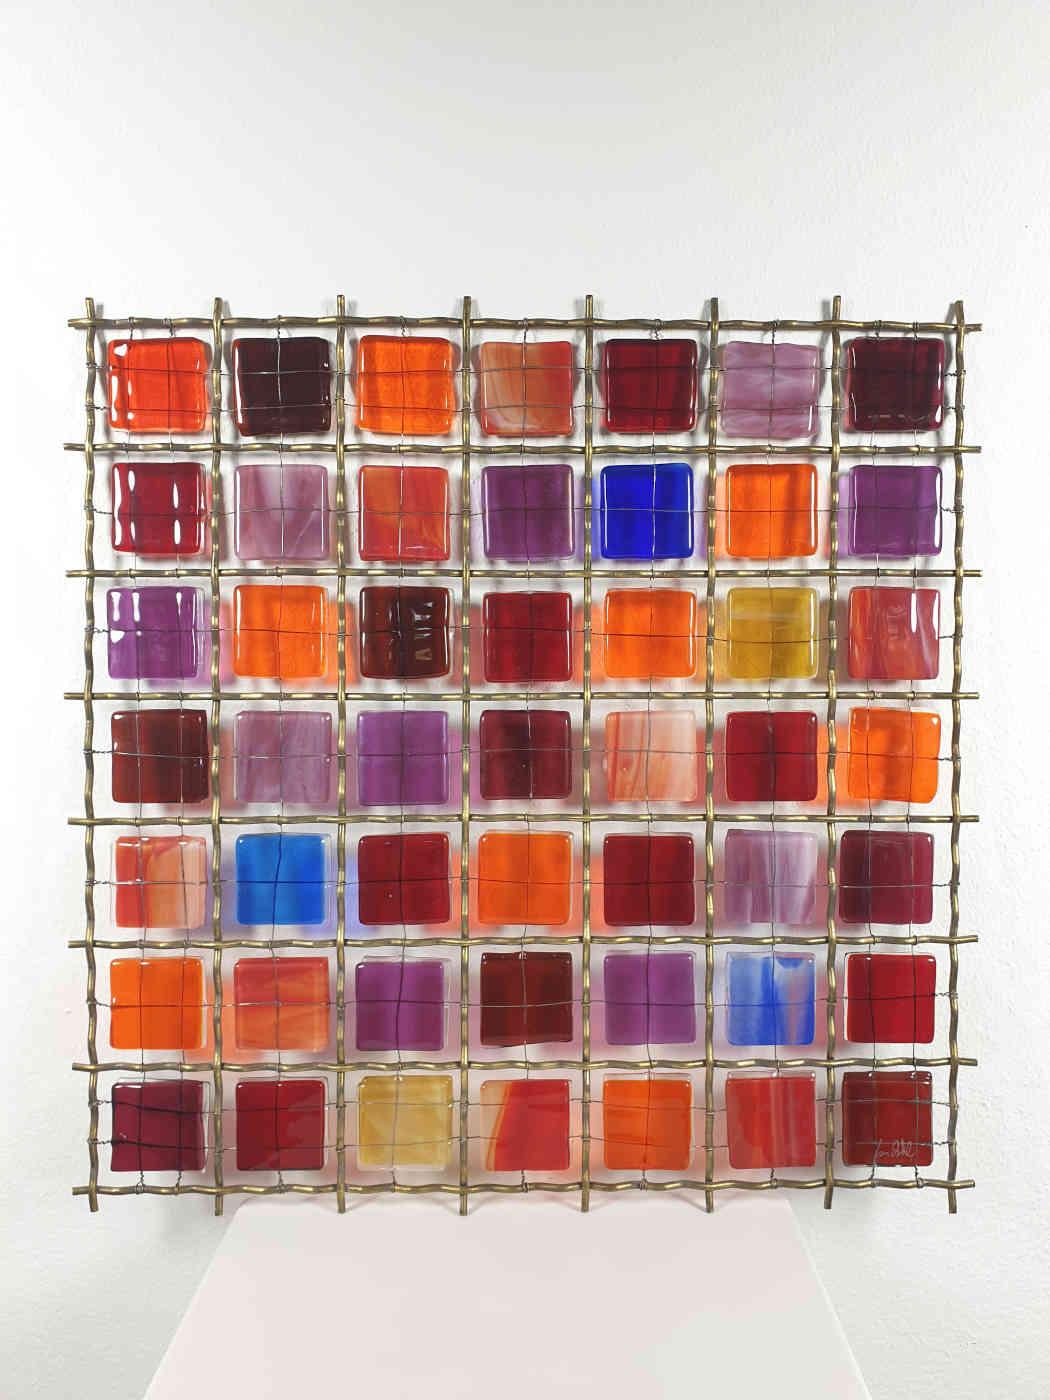 Winfried W. Wunderlich Quadrat